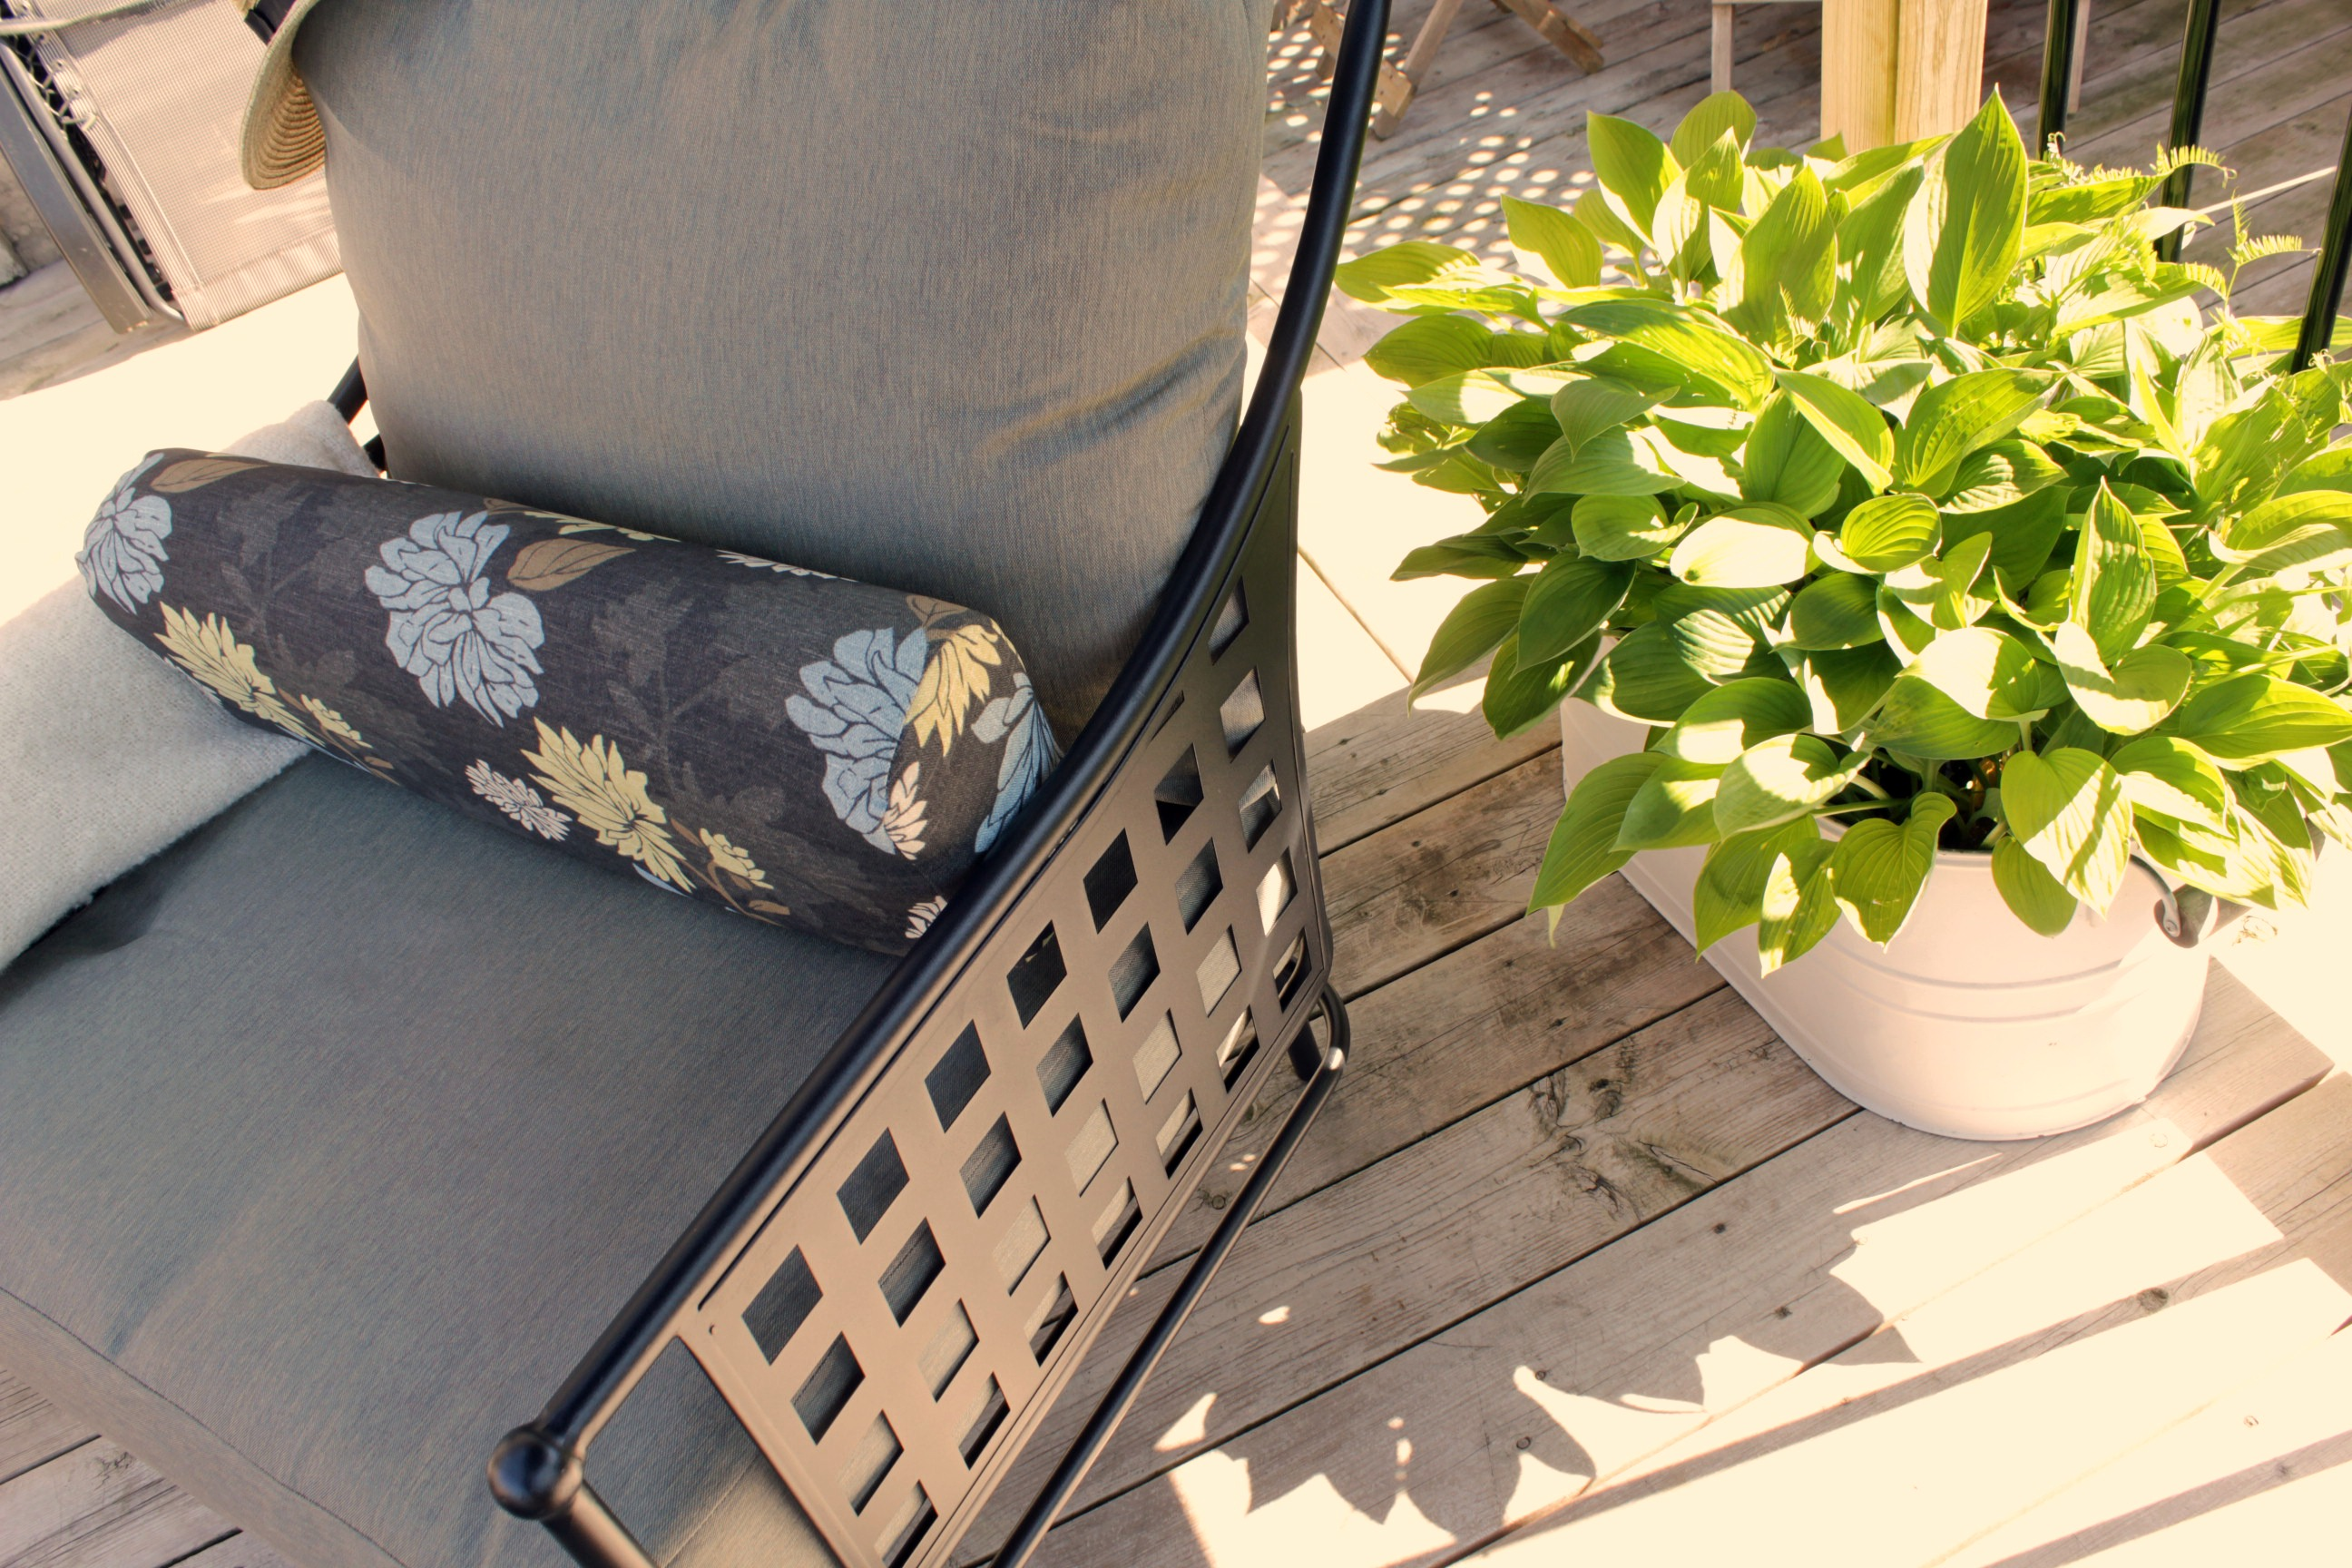 Hampton Bay Lynnfield patio set